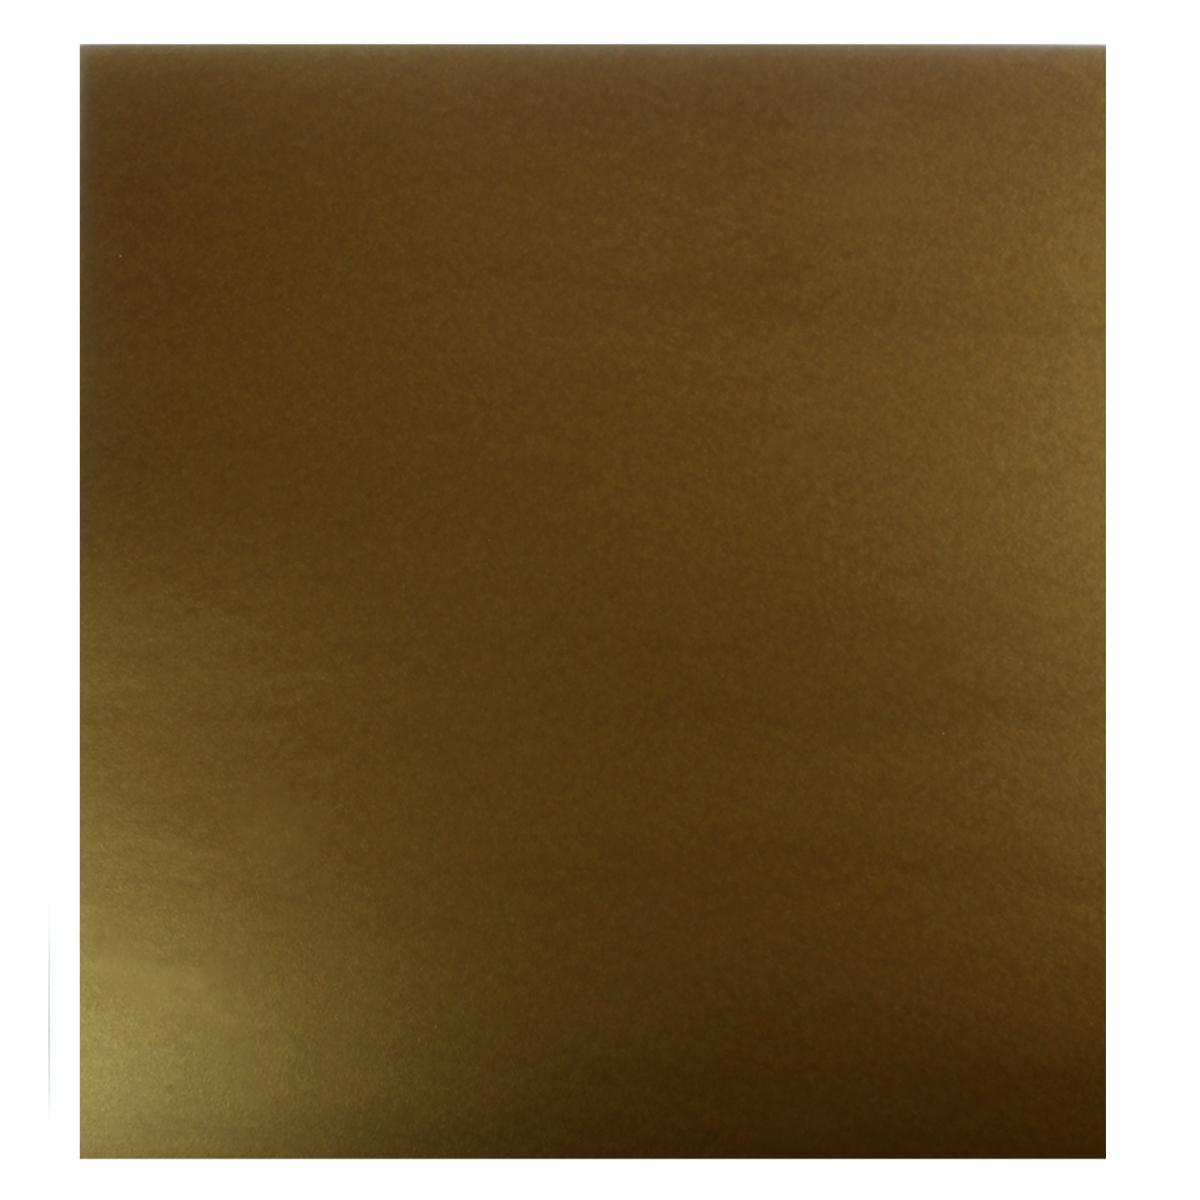 Cricut poster board gold